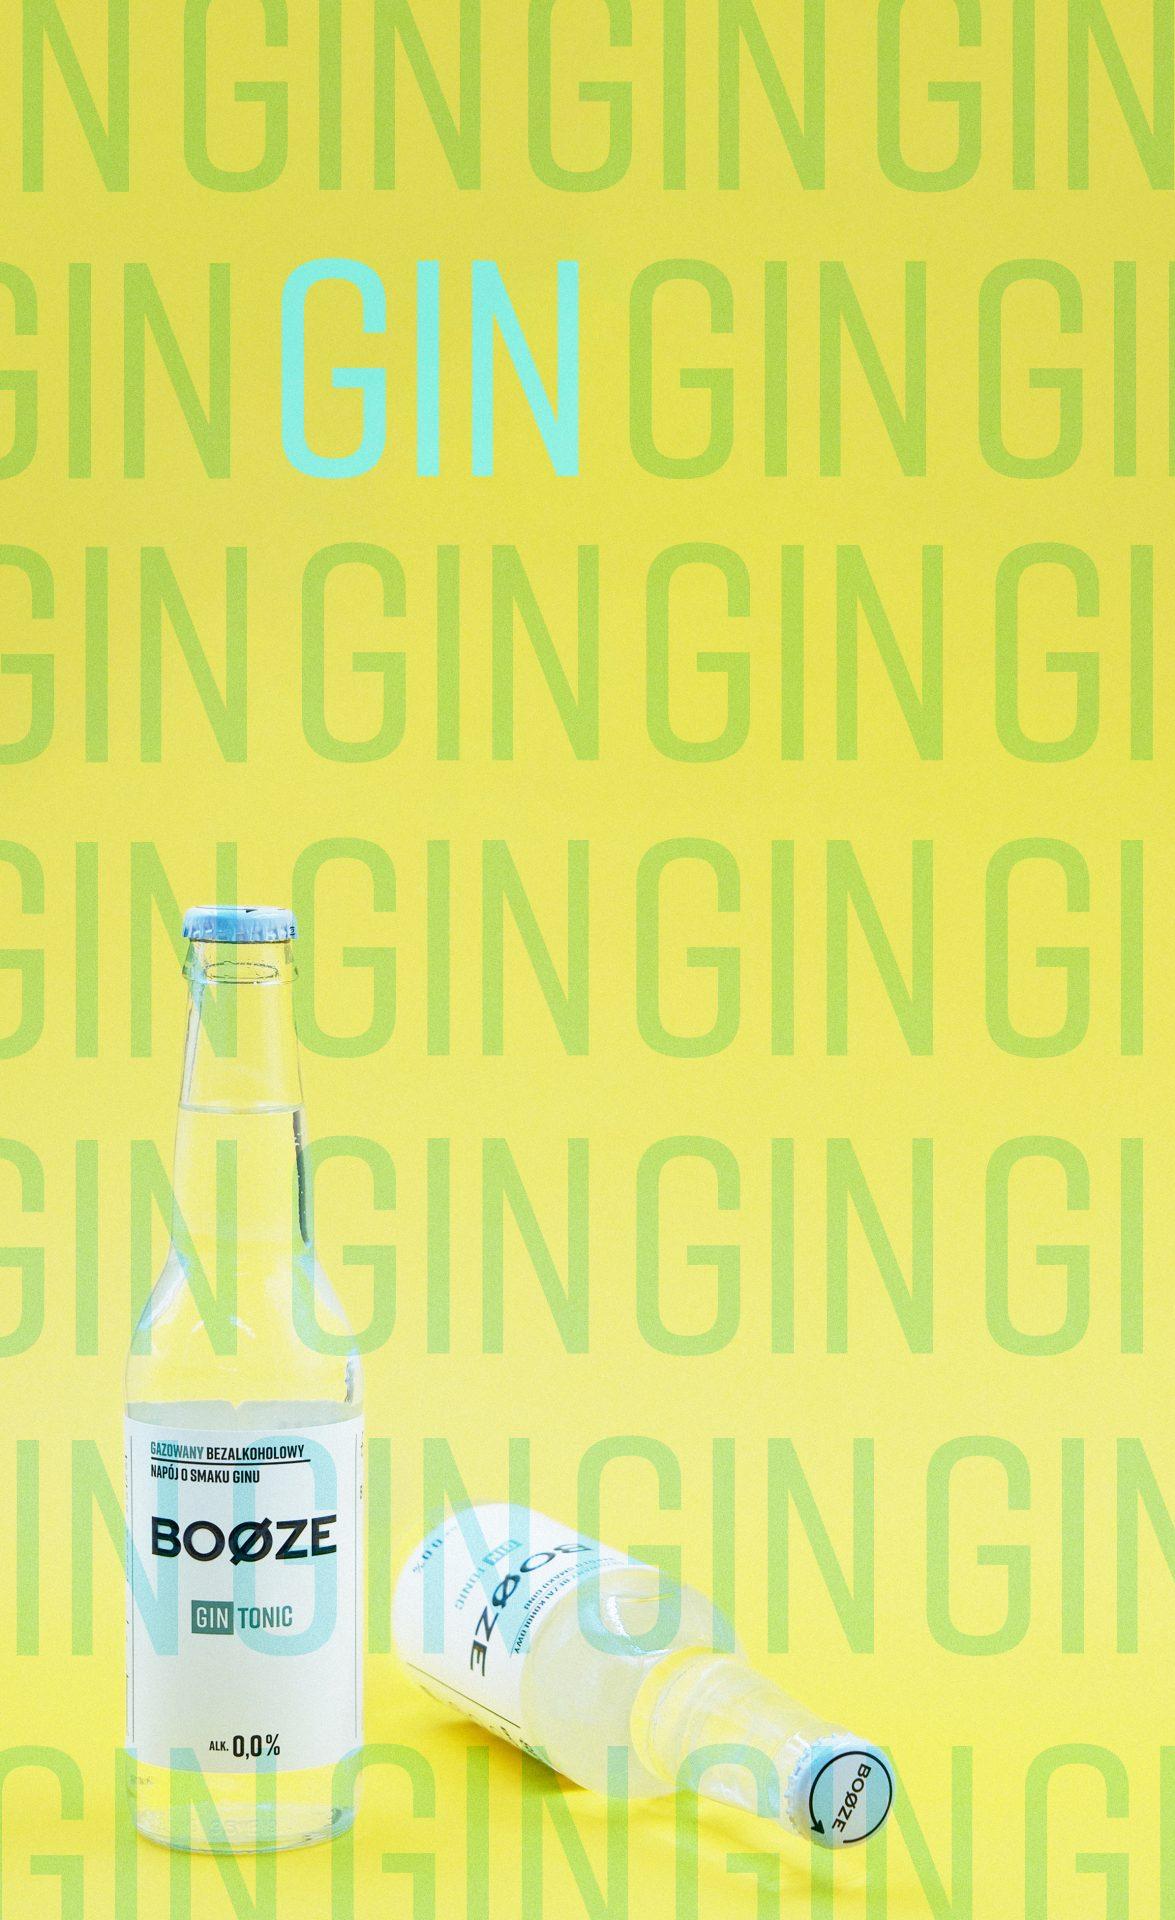 Booze Gin tonic